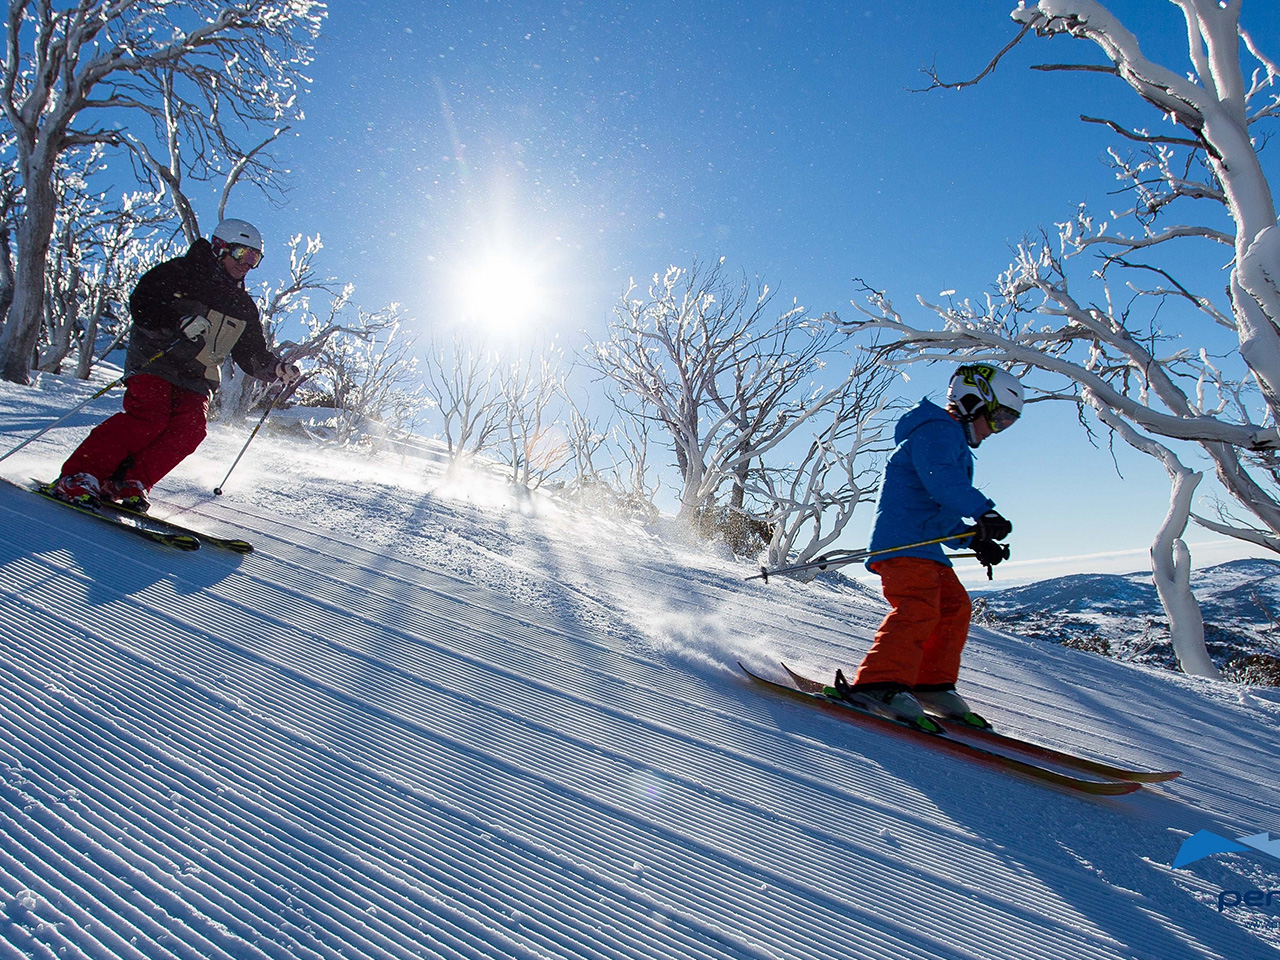 The Be a Fun Mum Guide to the Australian Ski Fields